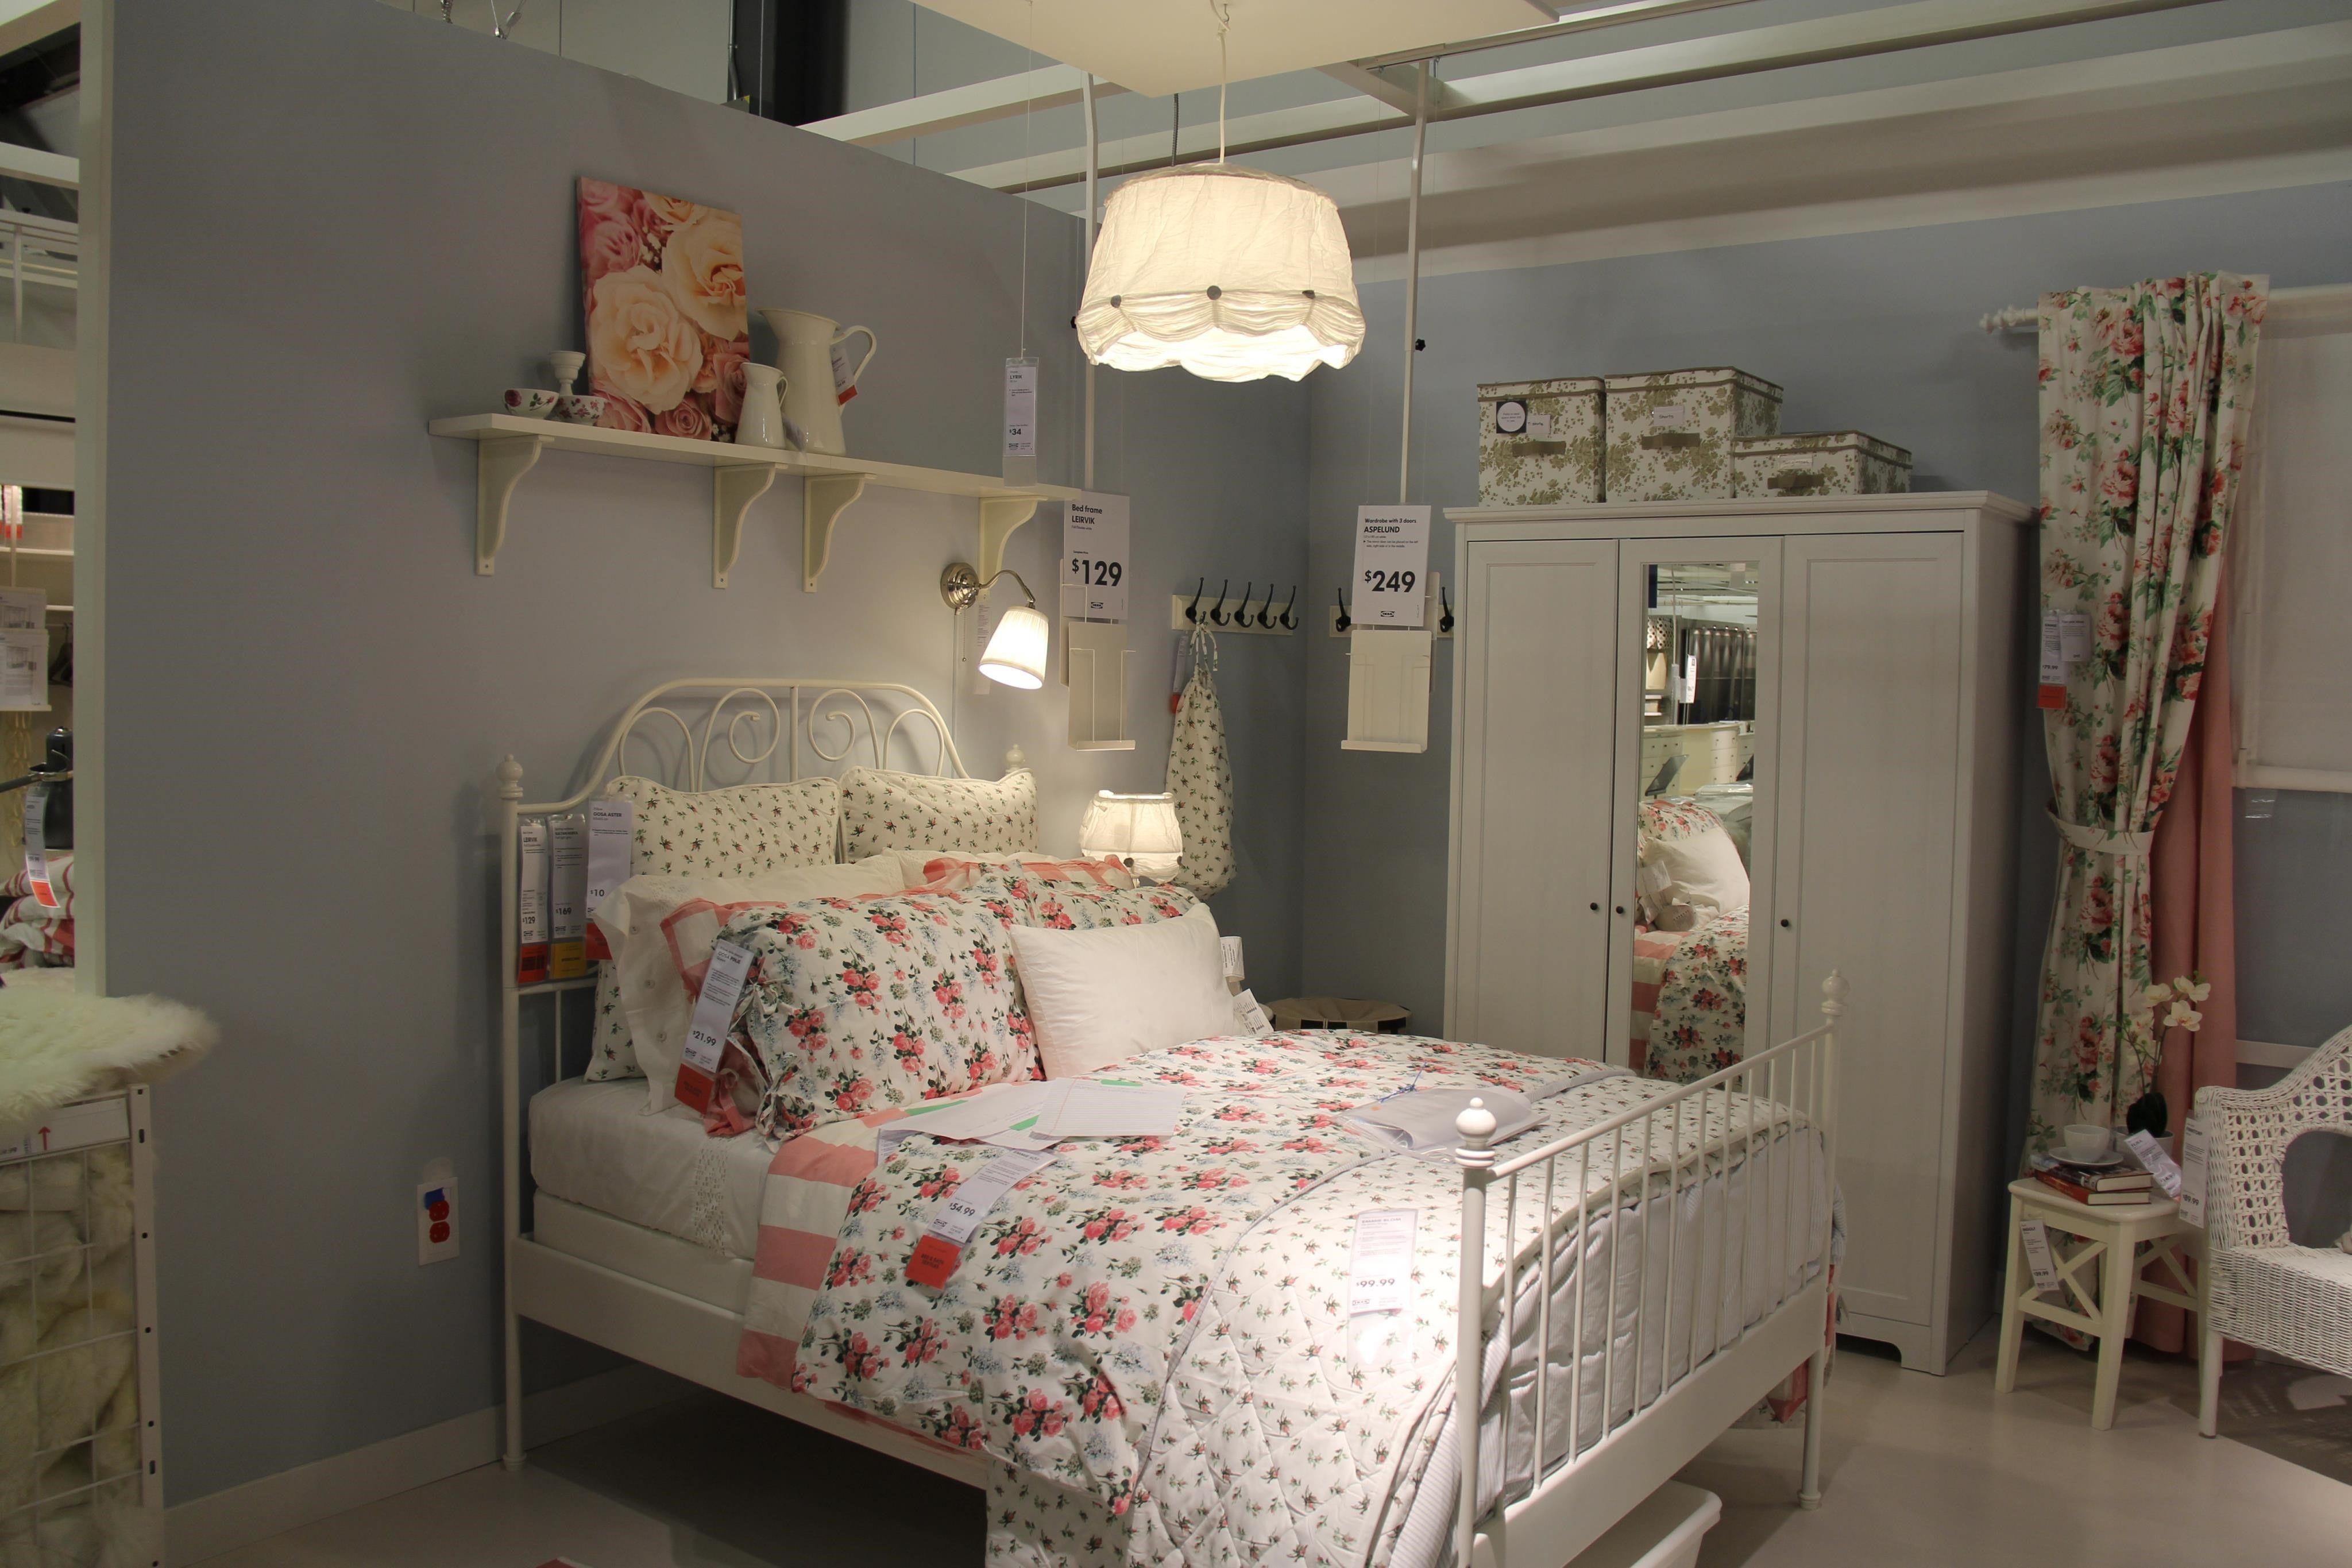 bedroom furniture sets at ikea Ikea bedroom sets